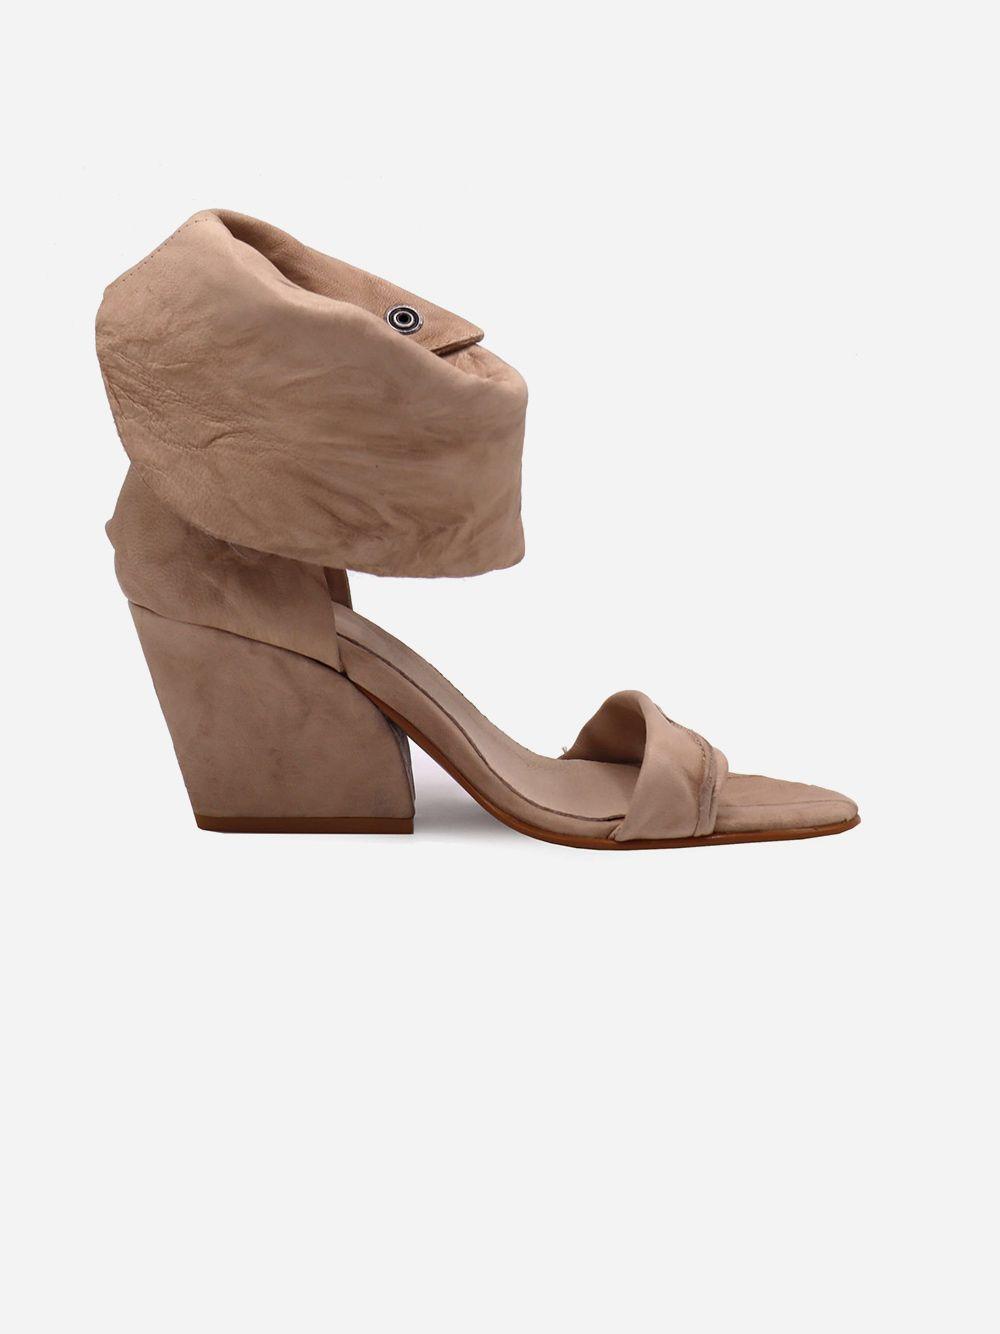 Sandálias Nude Textura | Pallas